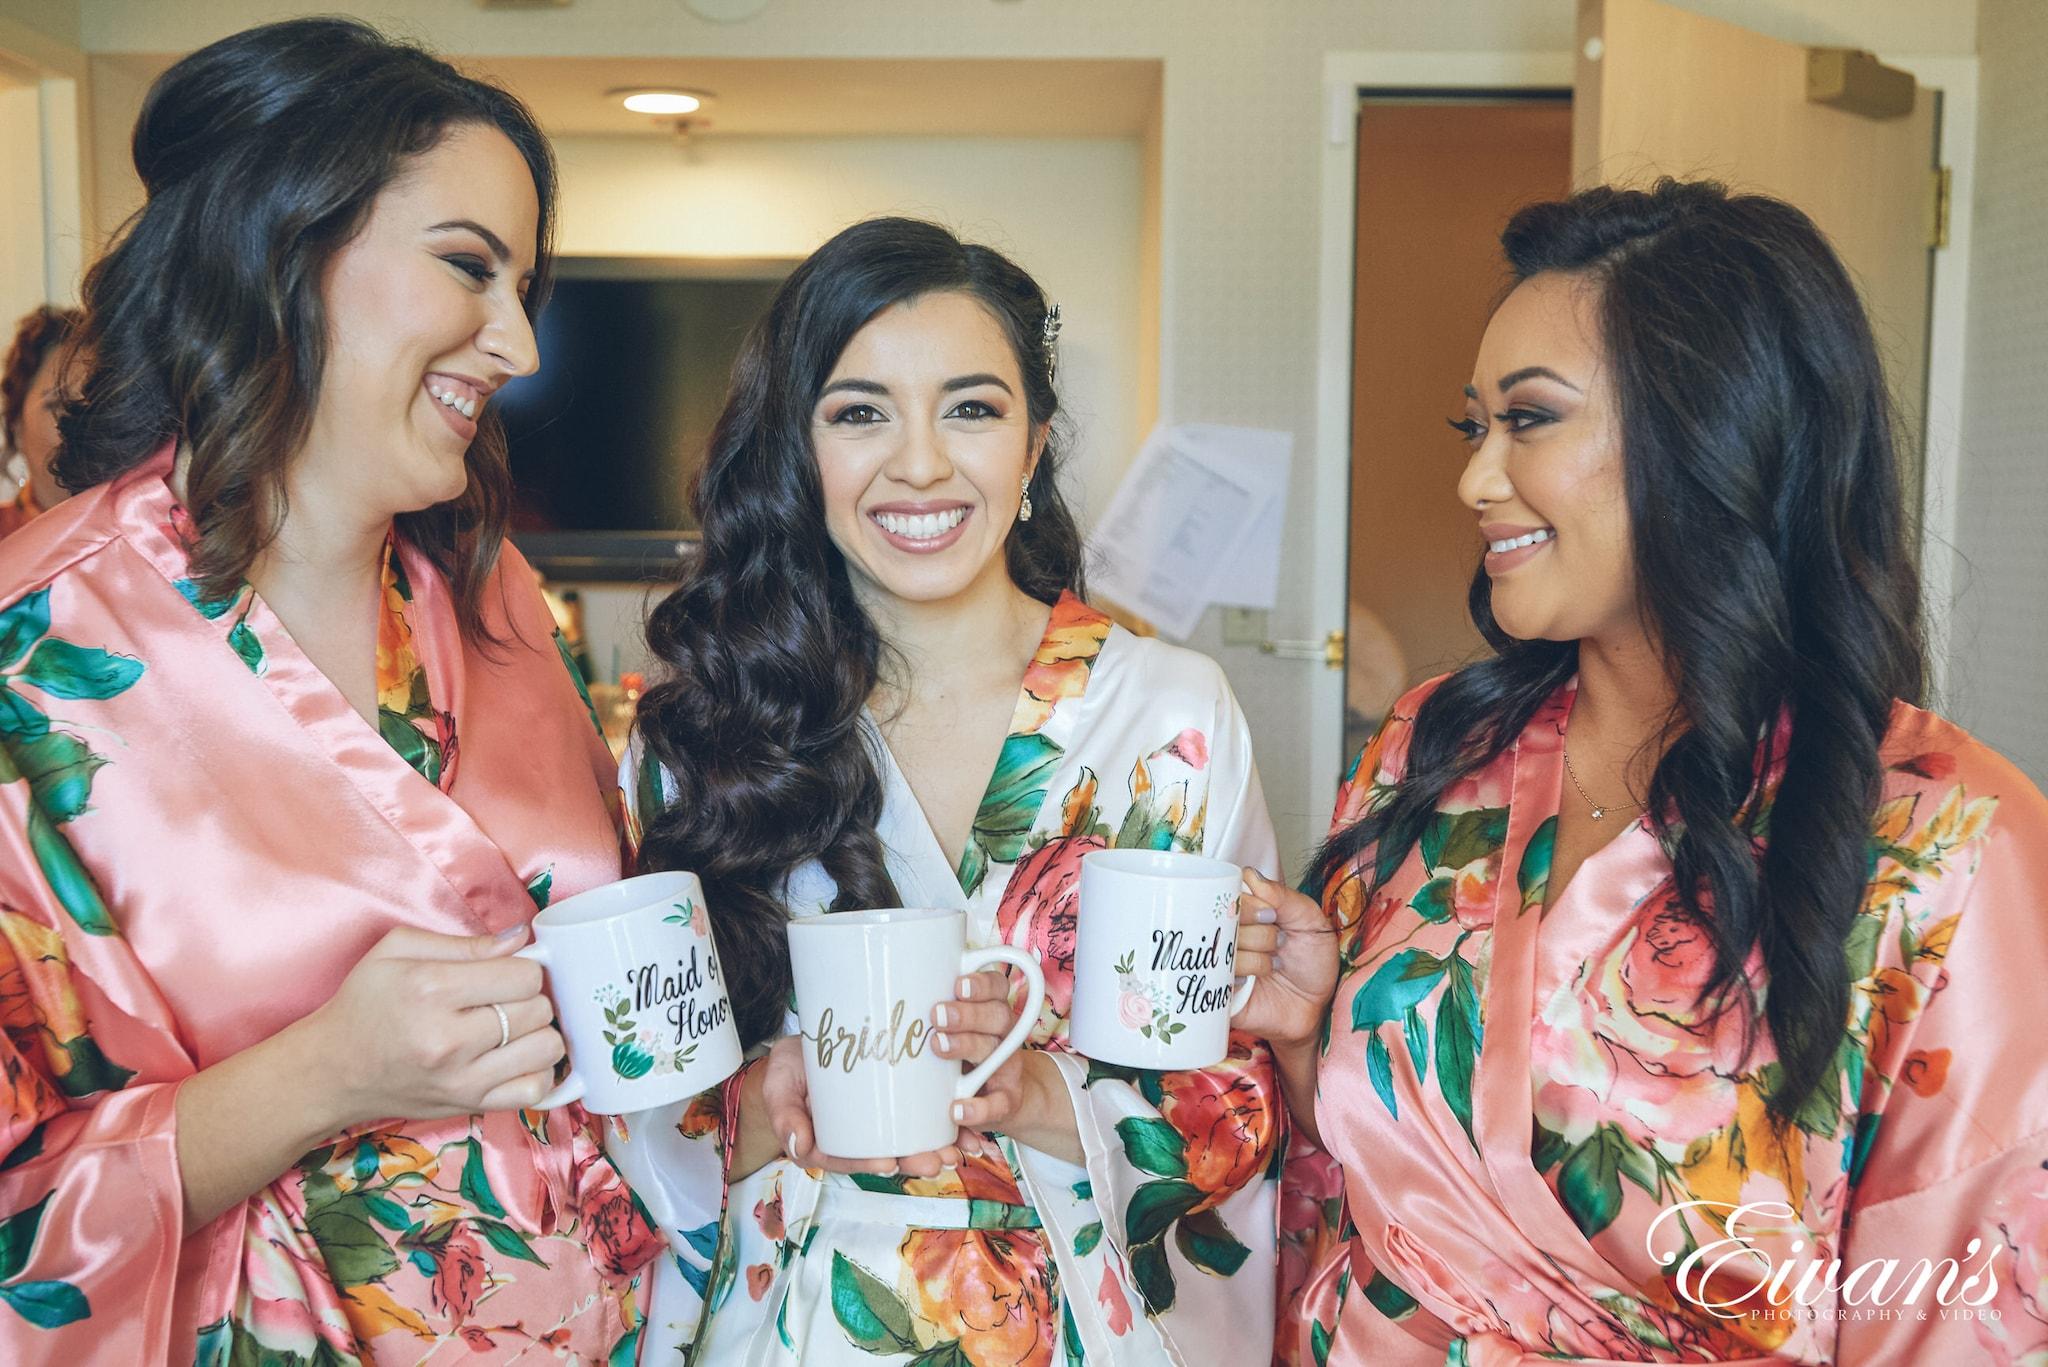 three women wearing floral robes holding mugs